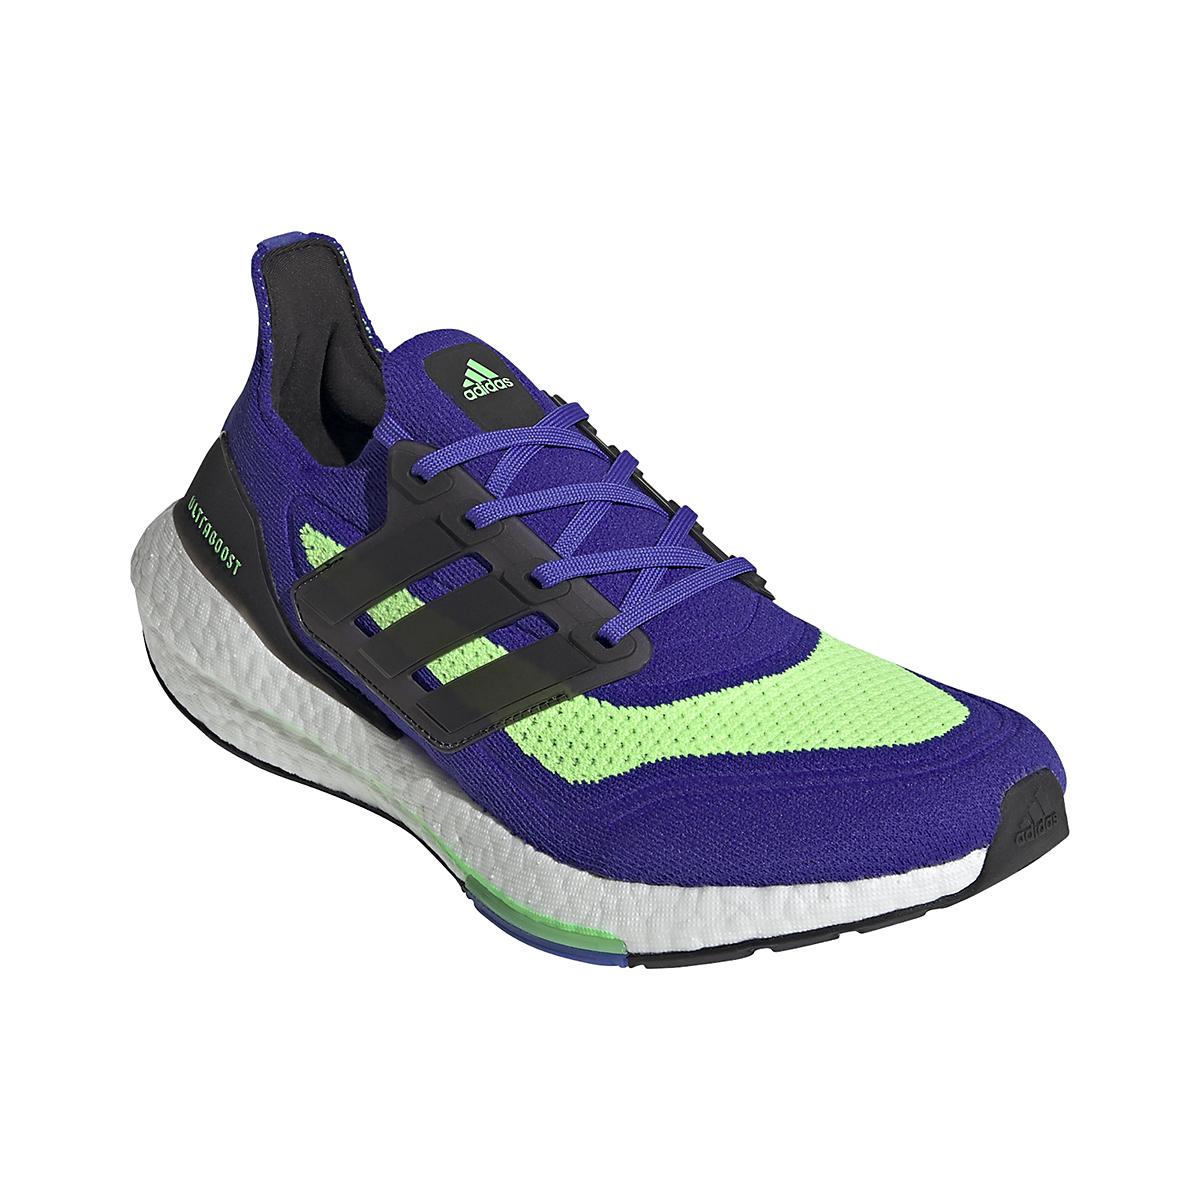 Men's Adidas UltraBOOST 21 Running Shoe - Color: Sonic Ink/Core Black/Screaming Green - Size: 6 - Width: Regular, Sonic Ink/Core Black/Screaming Green, large, image 3